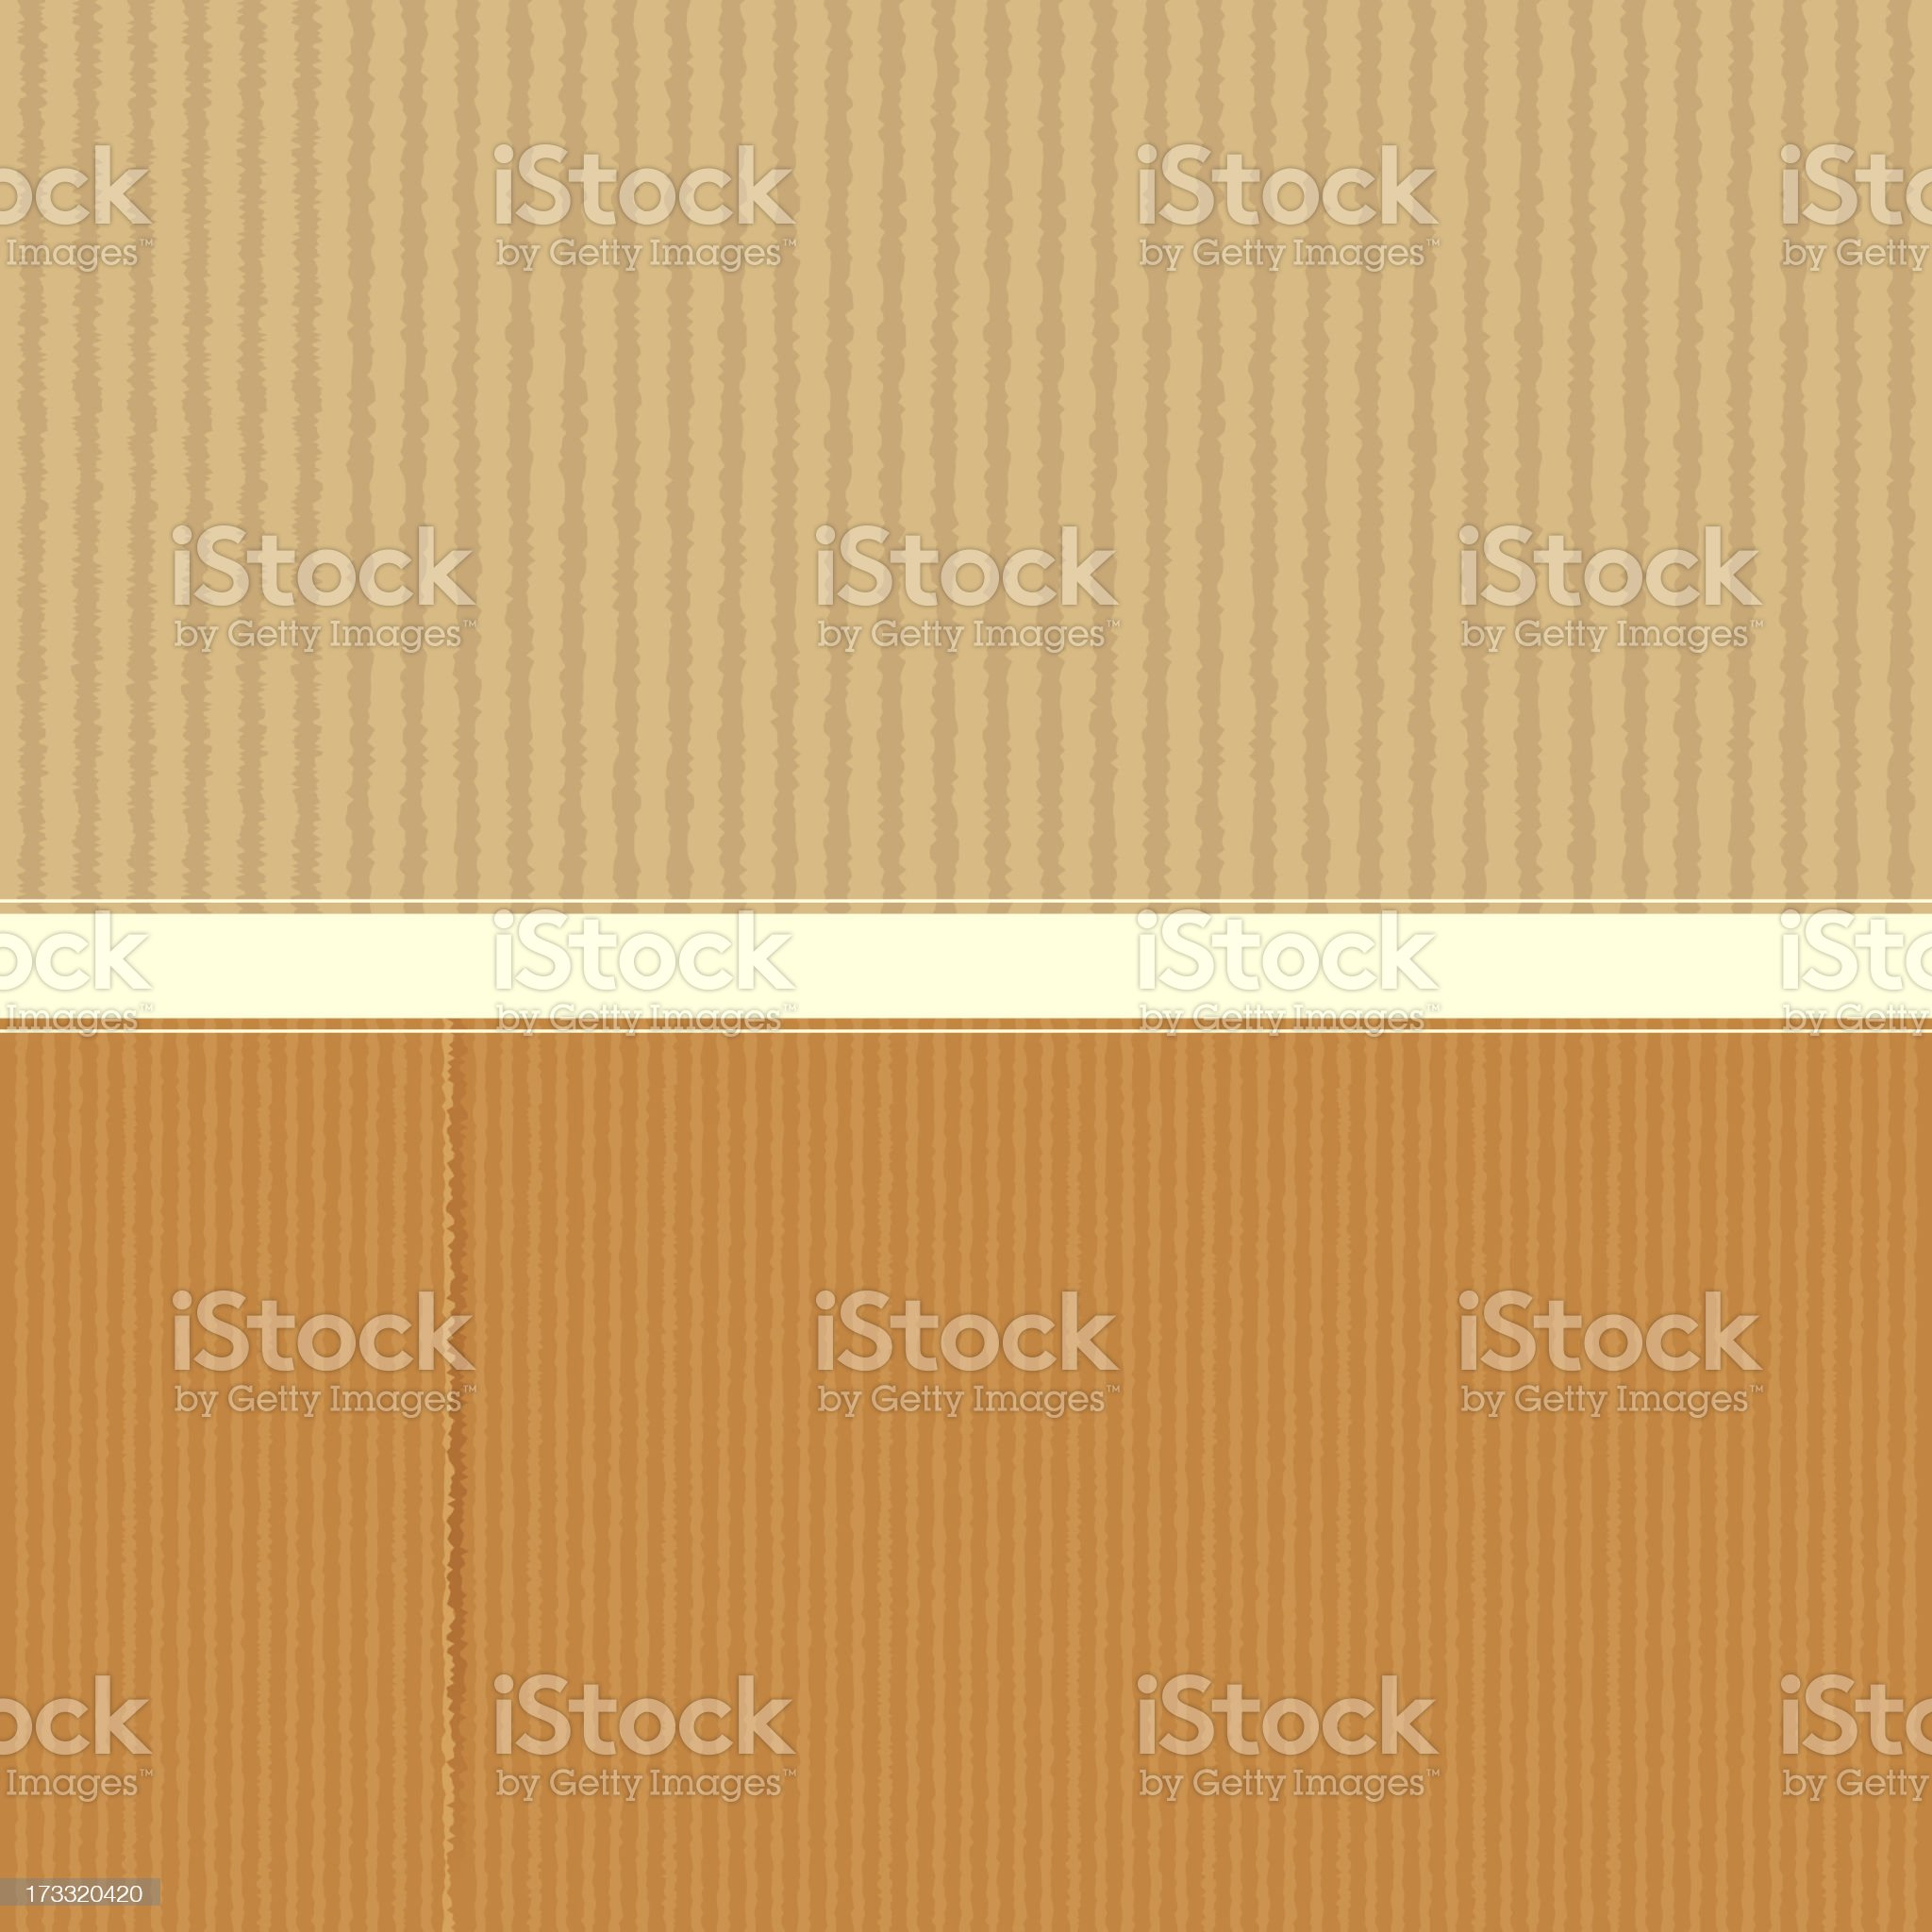 Cardboard Texture royalty-free stock vector art